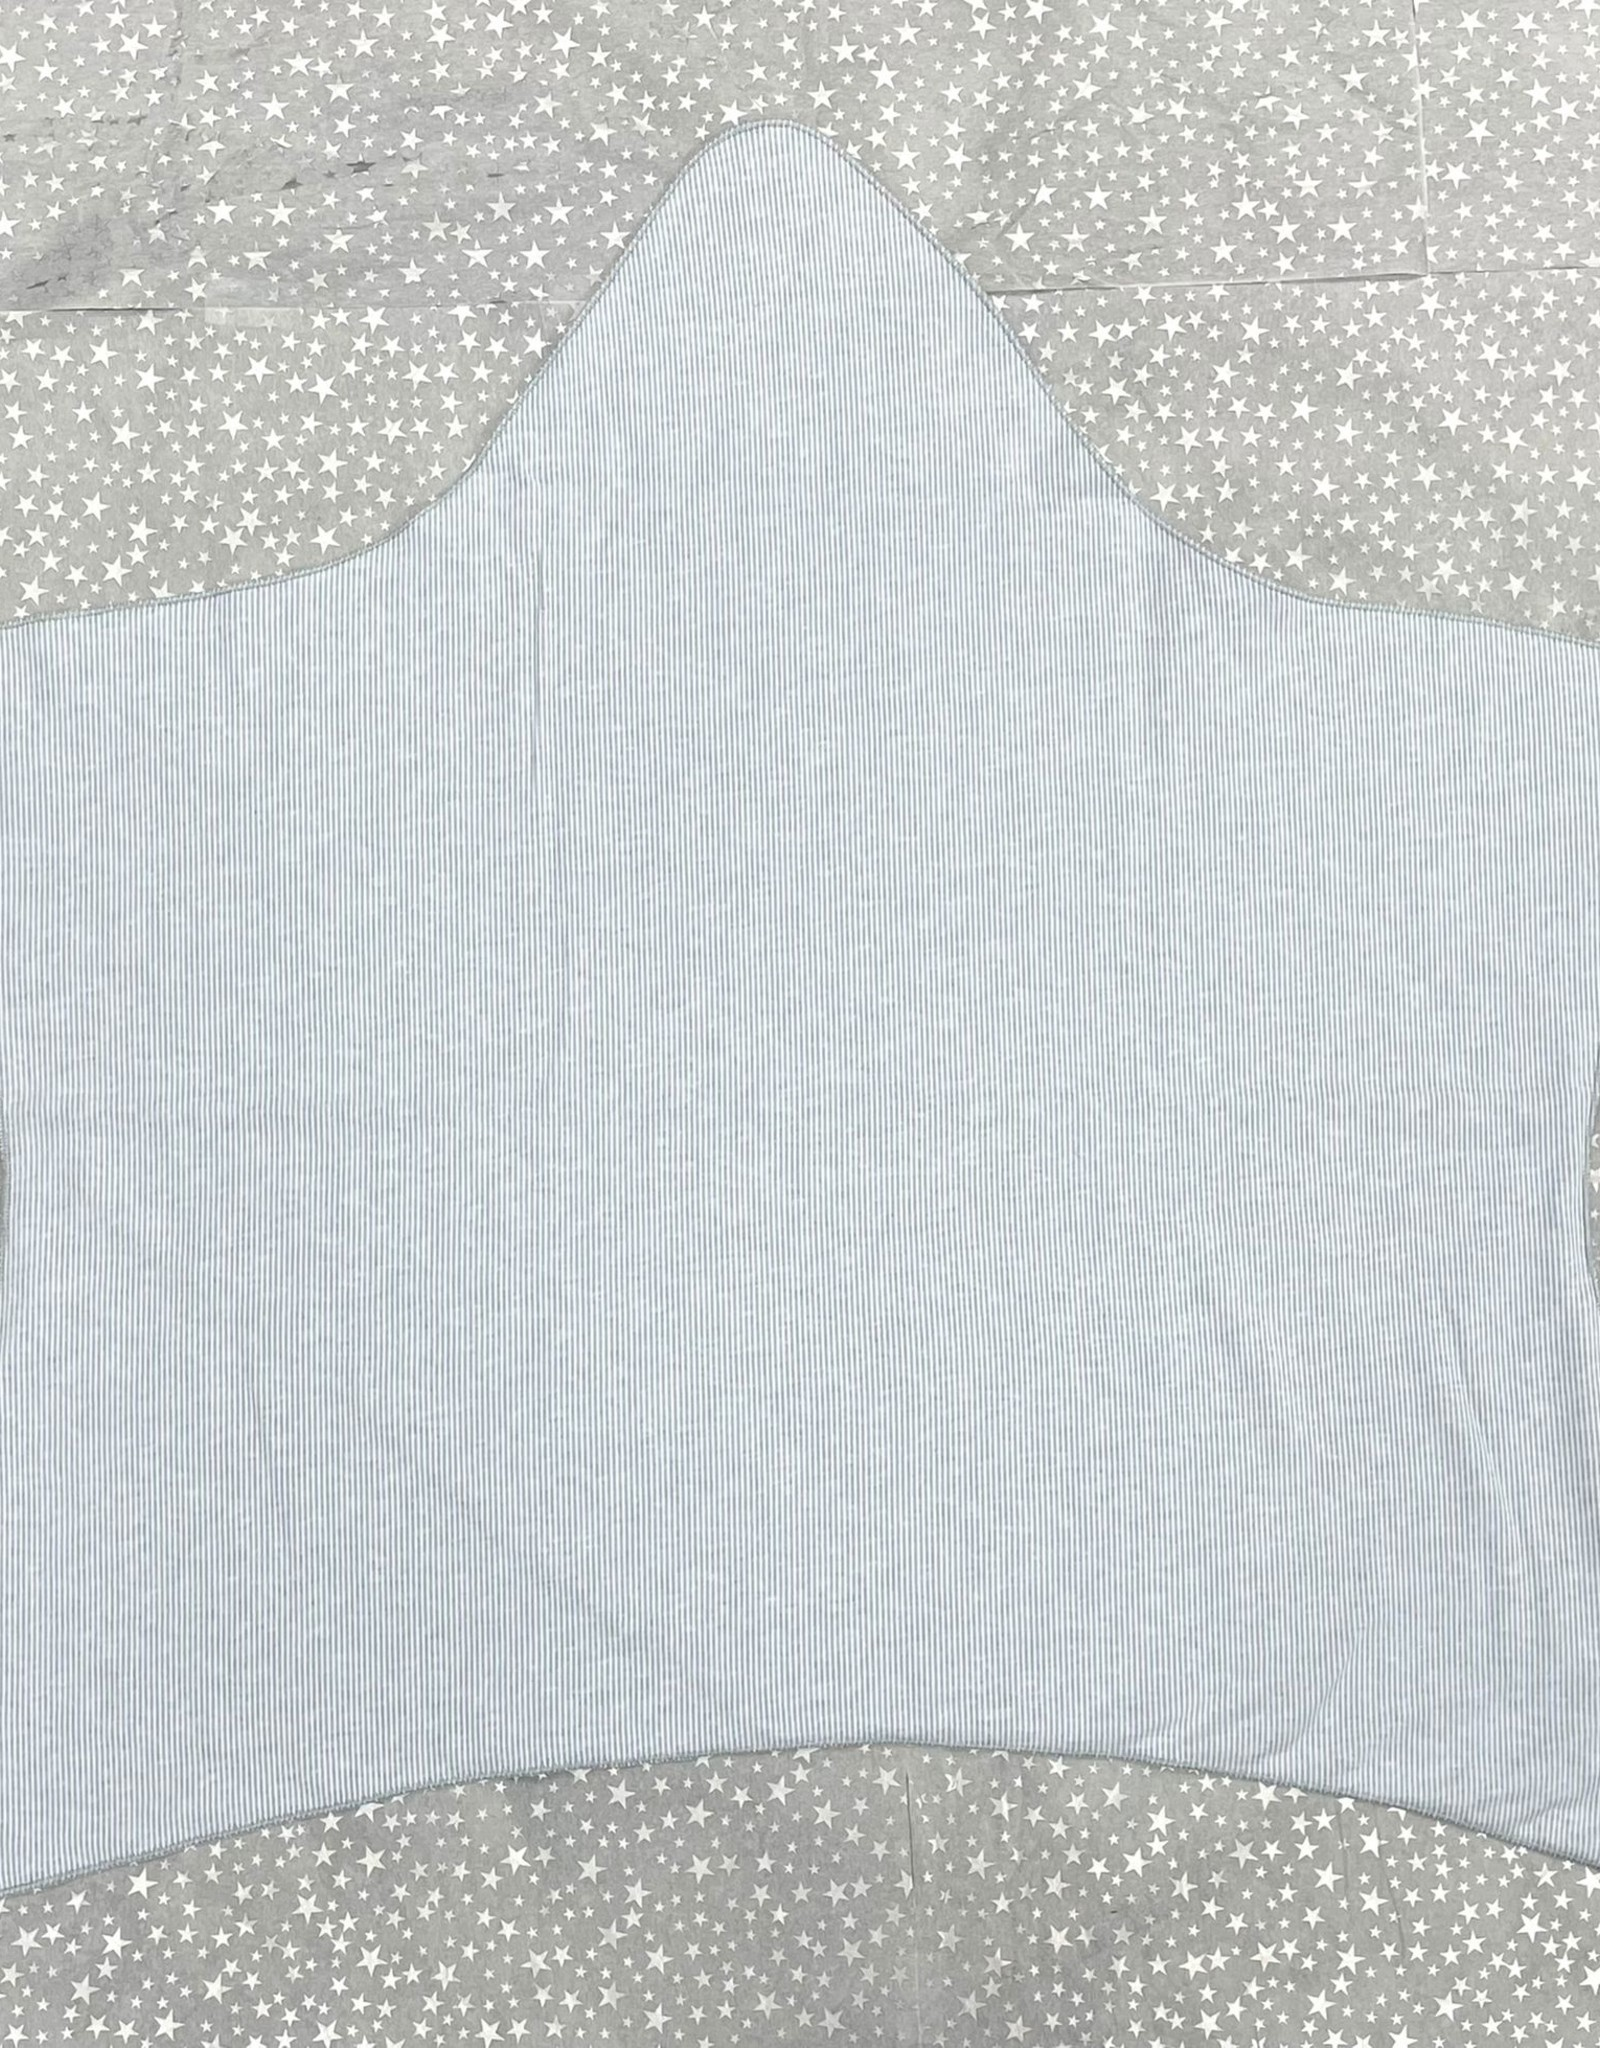 FRAGILE Fragile Thin Ribbed Cotton Star Blanket